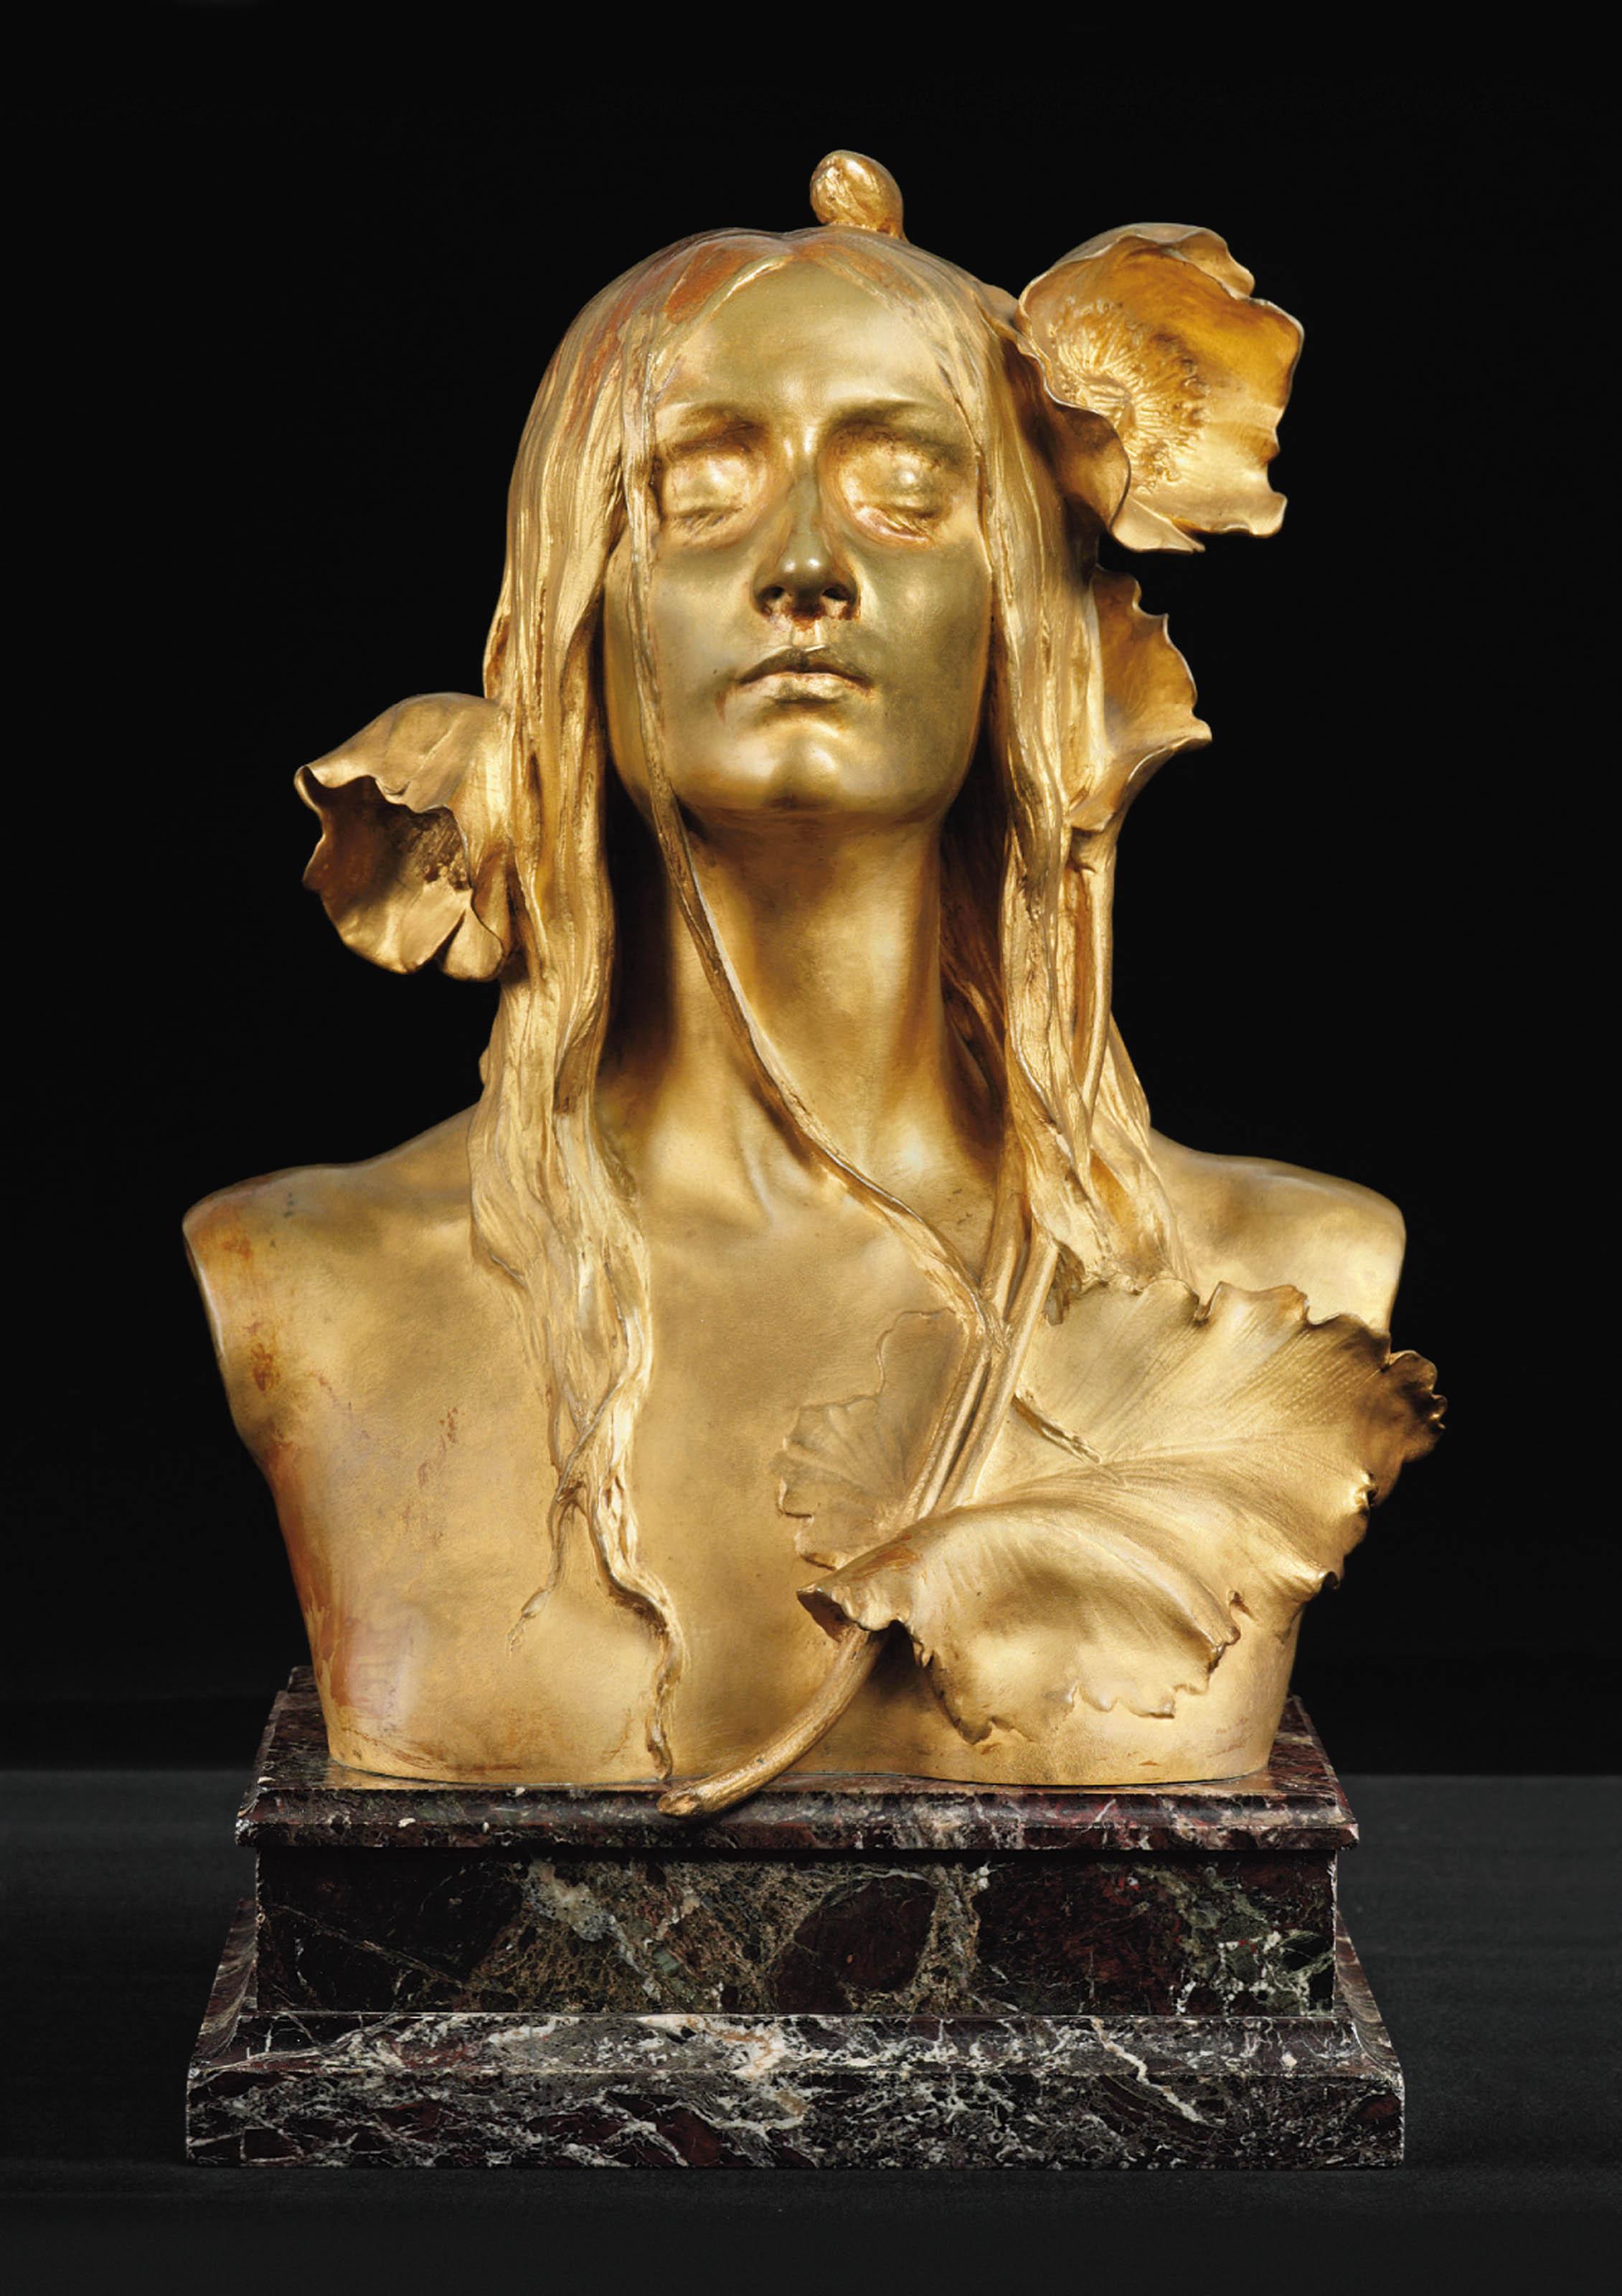 MAURICE BOUVAL (1863-1920)